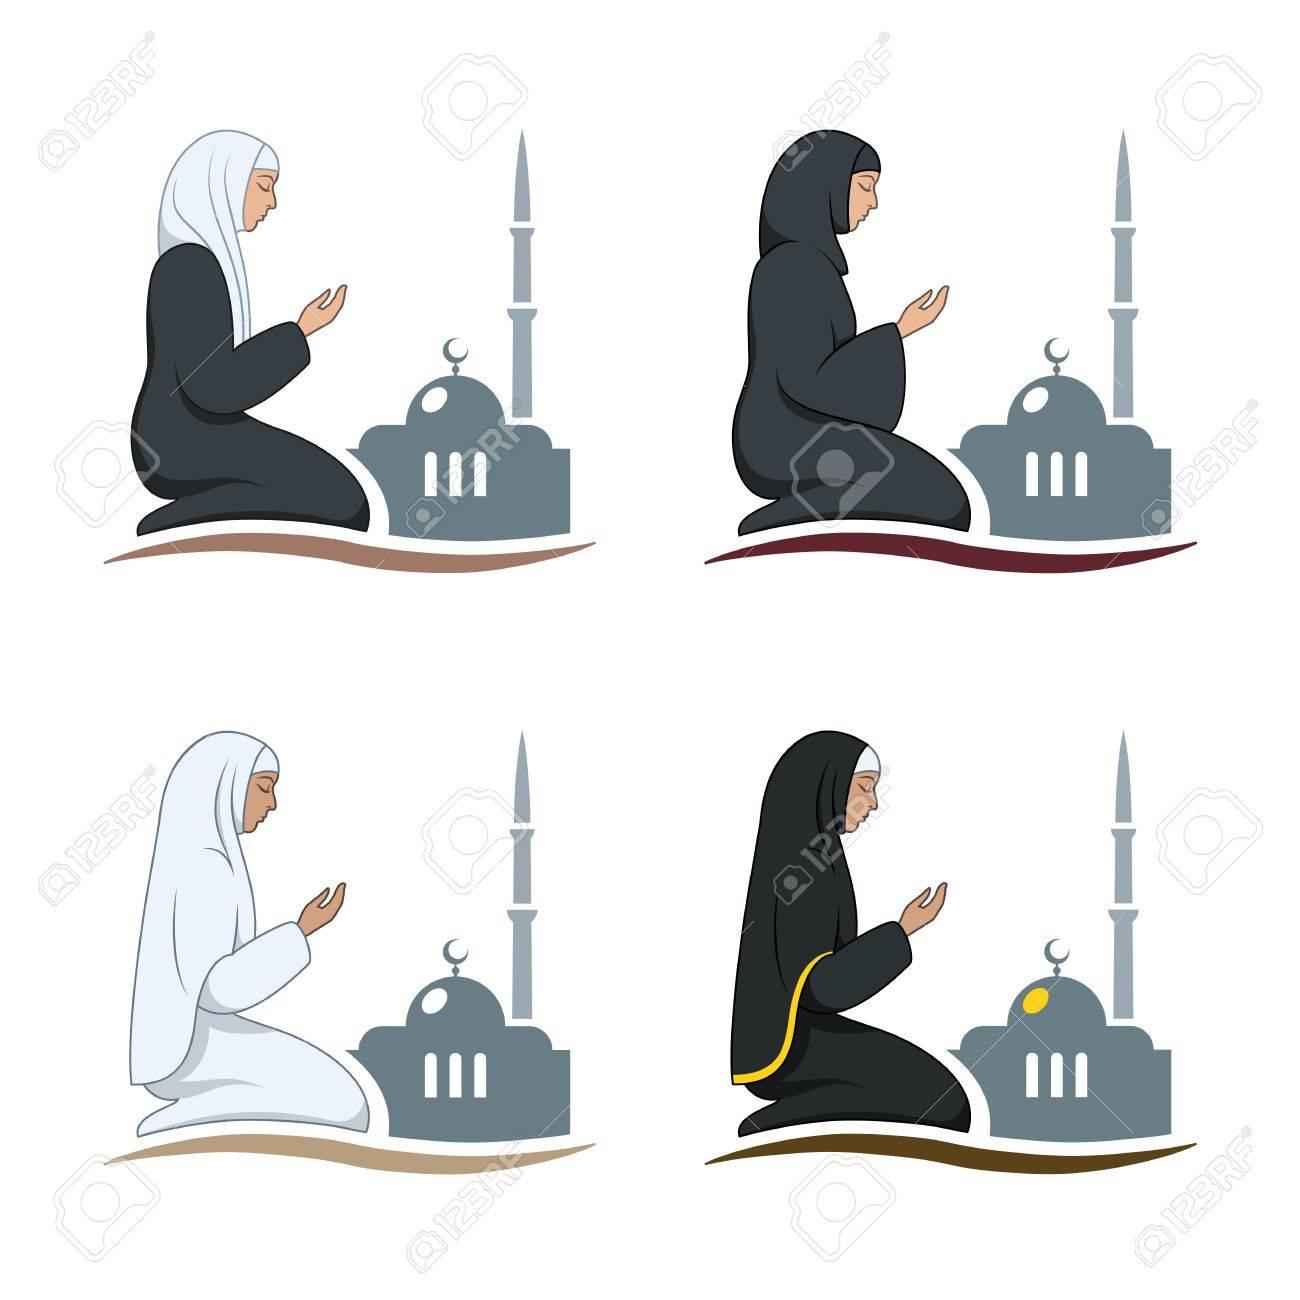 Traditionally clothed muslim woman making a supplication (salah)